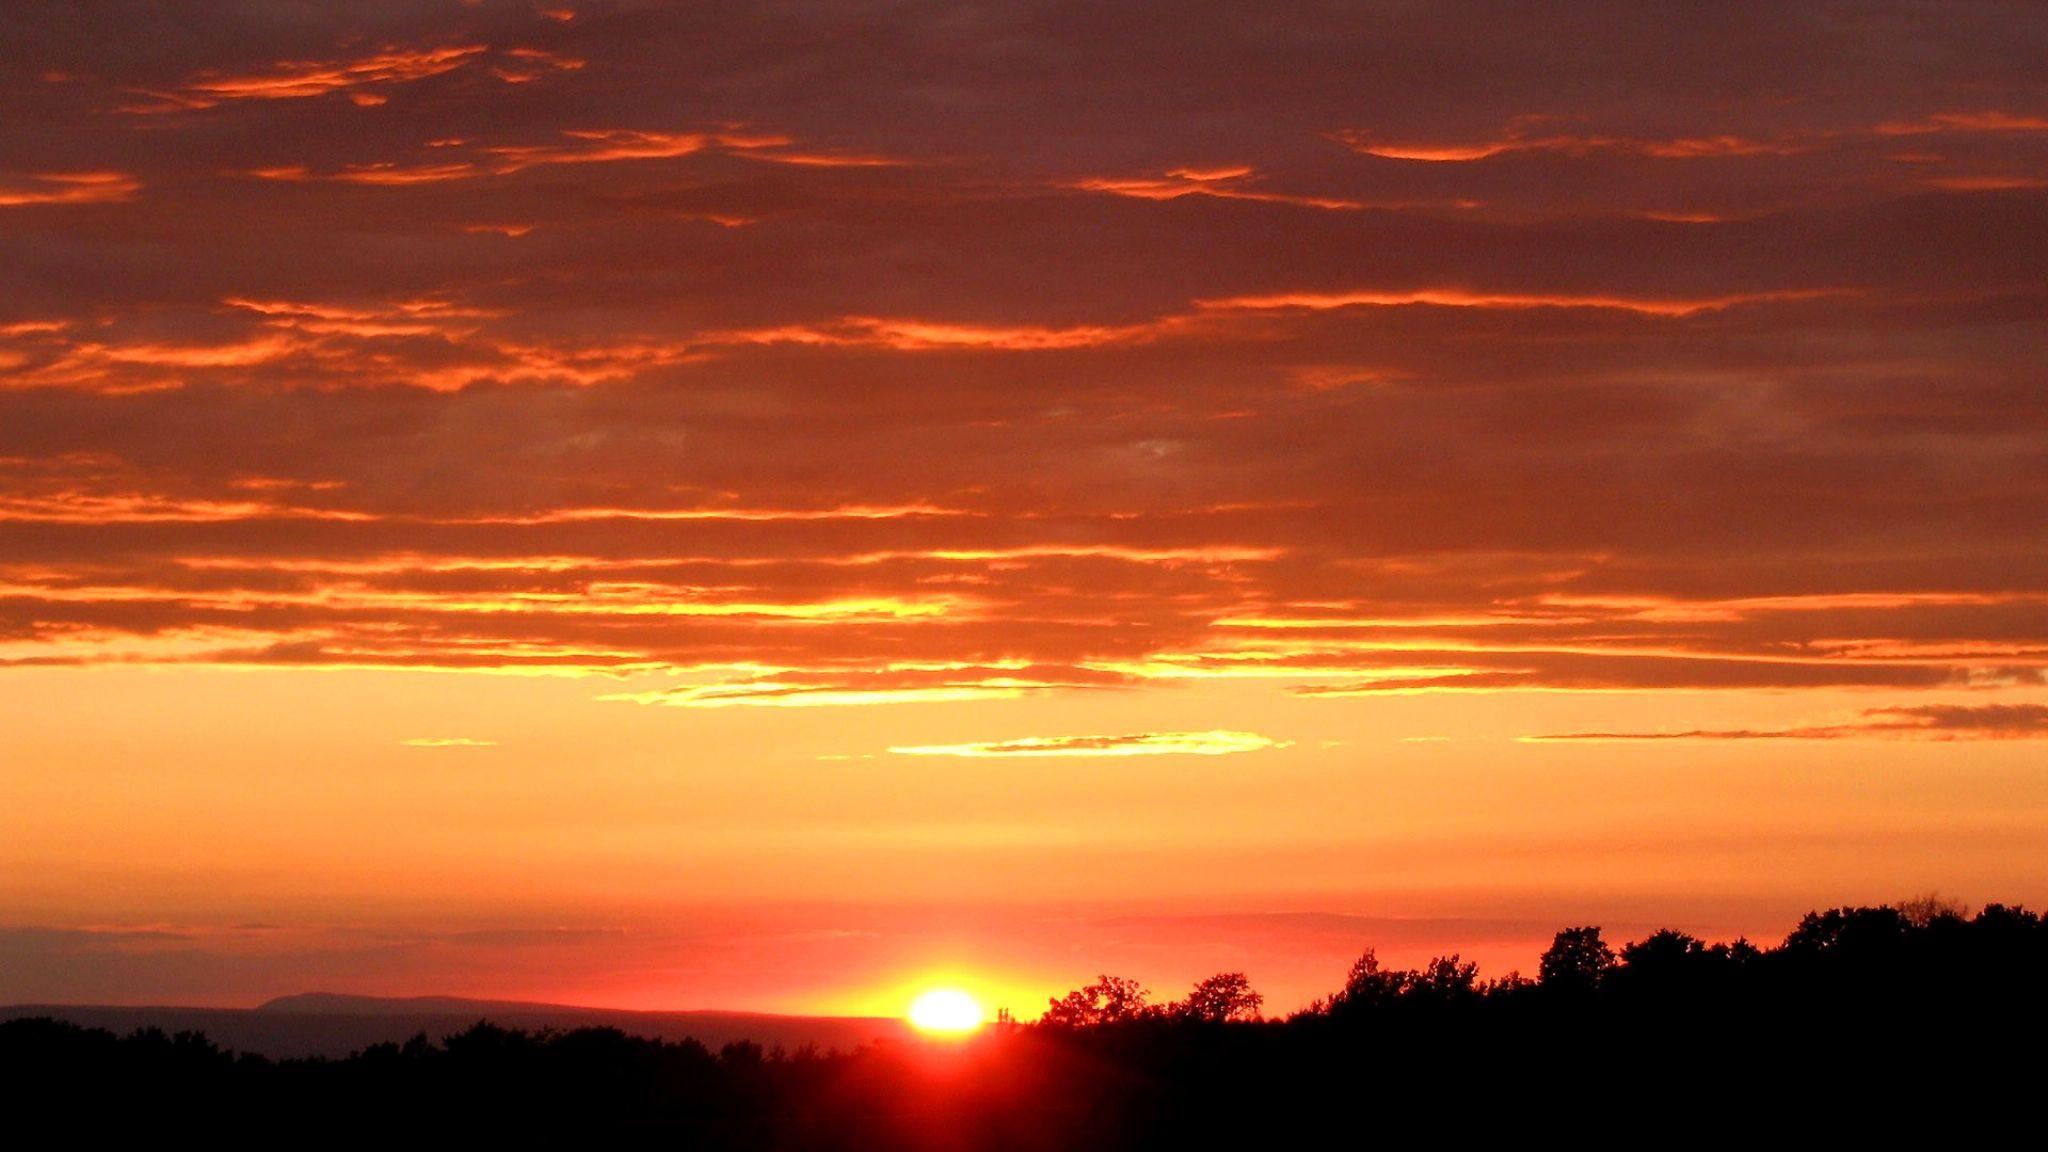 Sunset by Alessandro Anadima